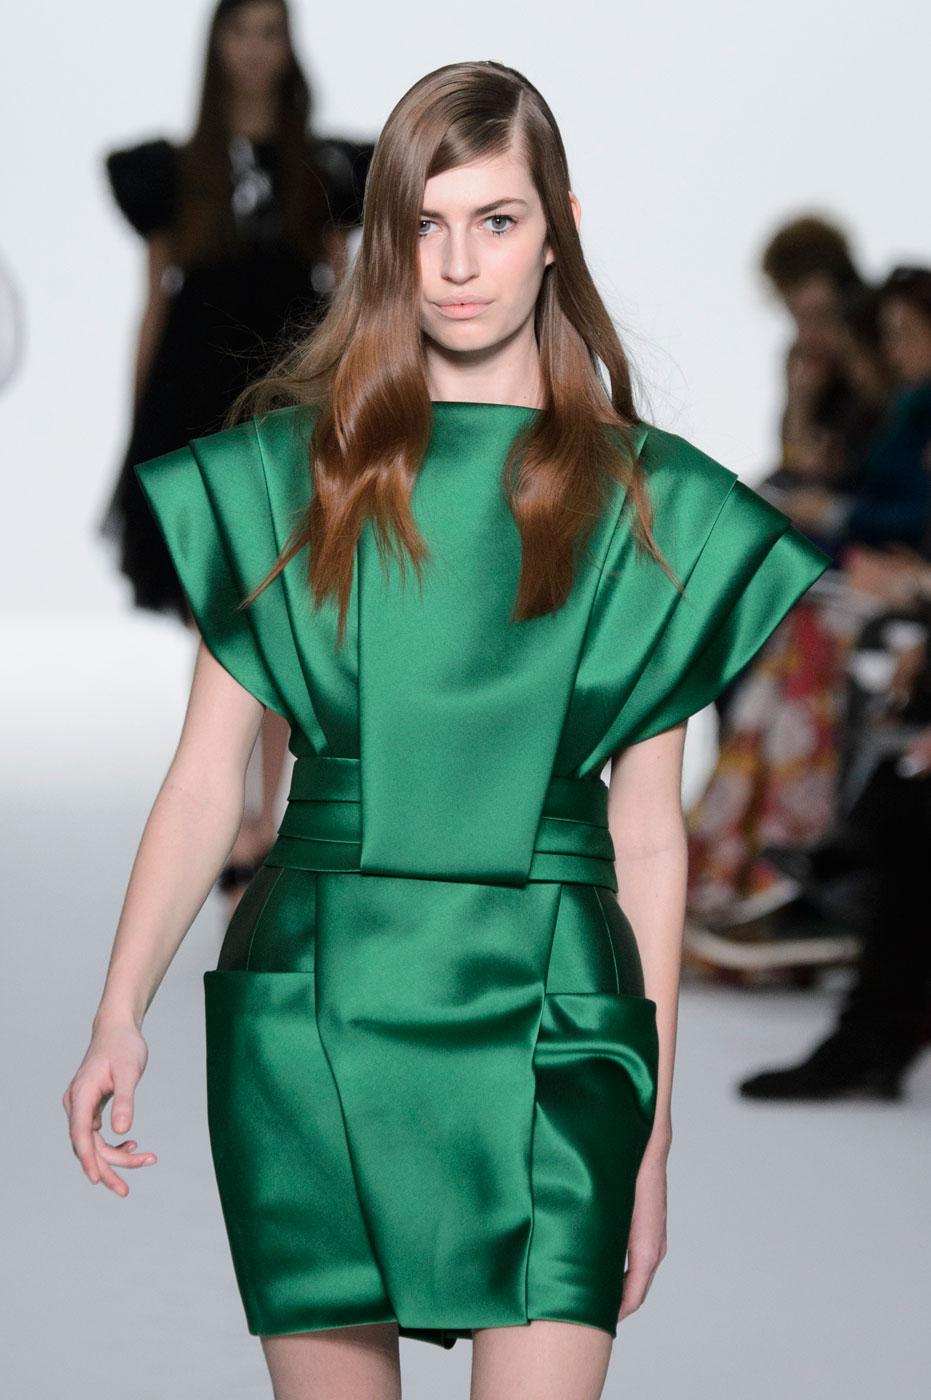 Kayek-fashion-runway-show-haute-couture-paris-spring-summer-2015-the-impression-32